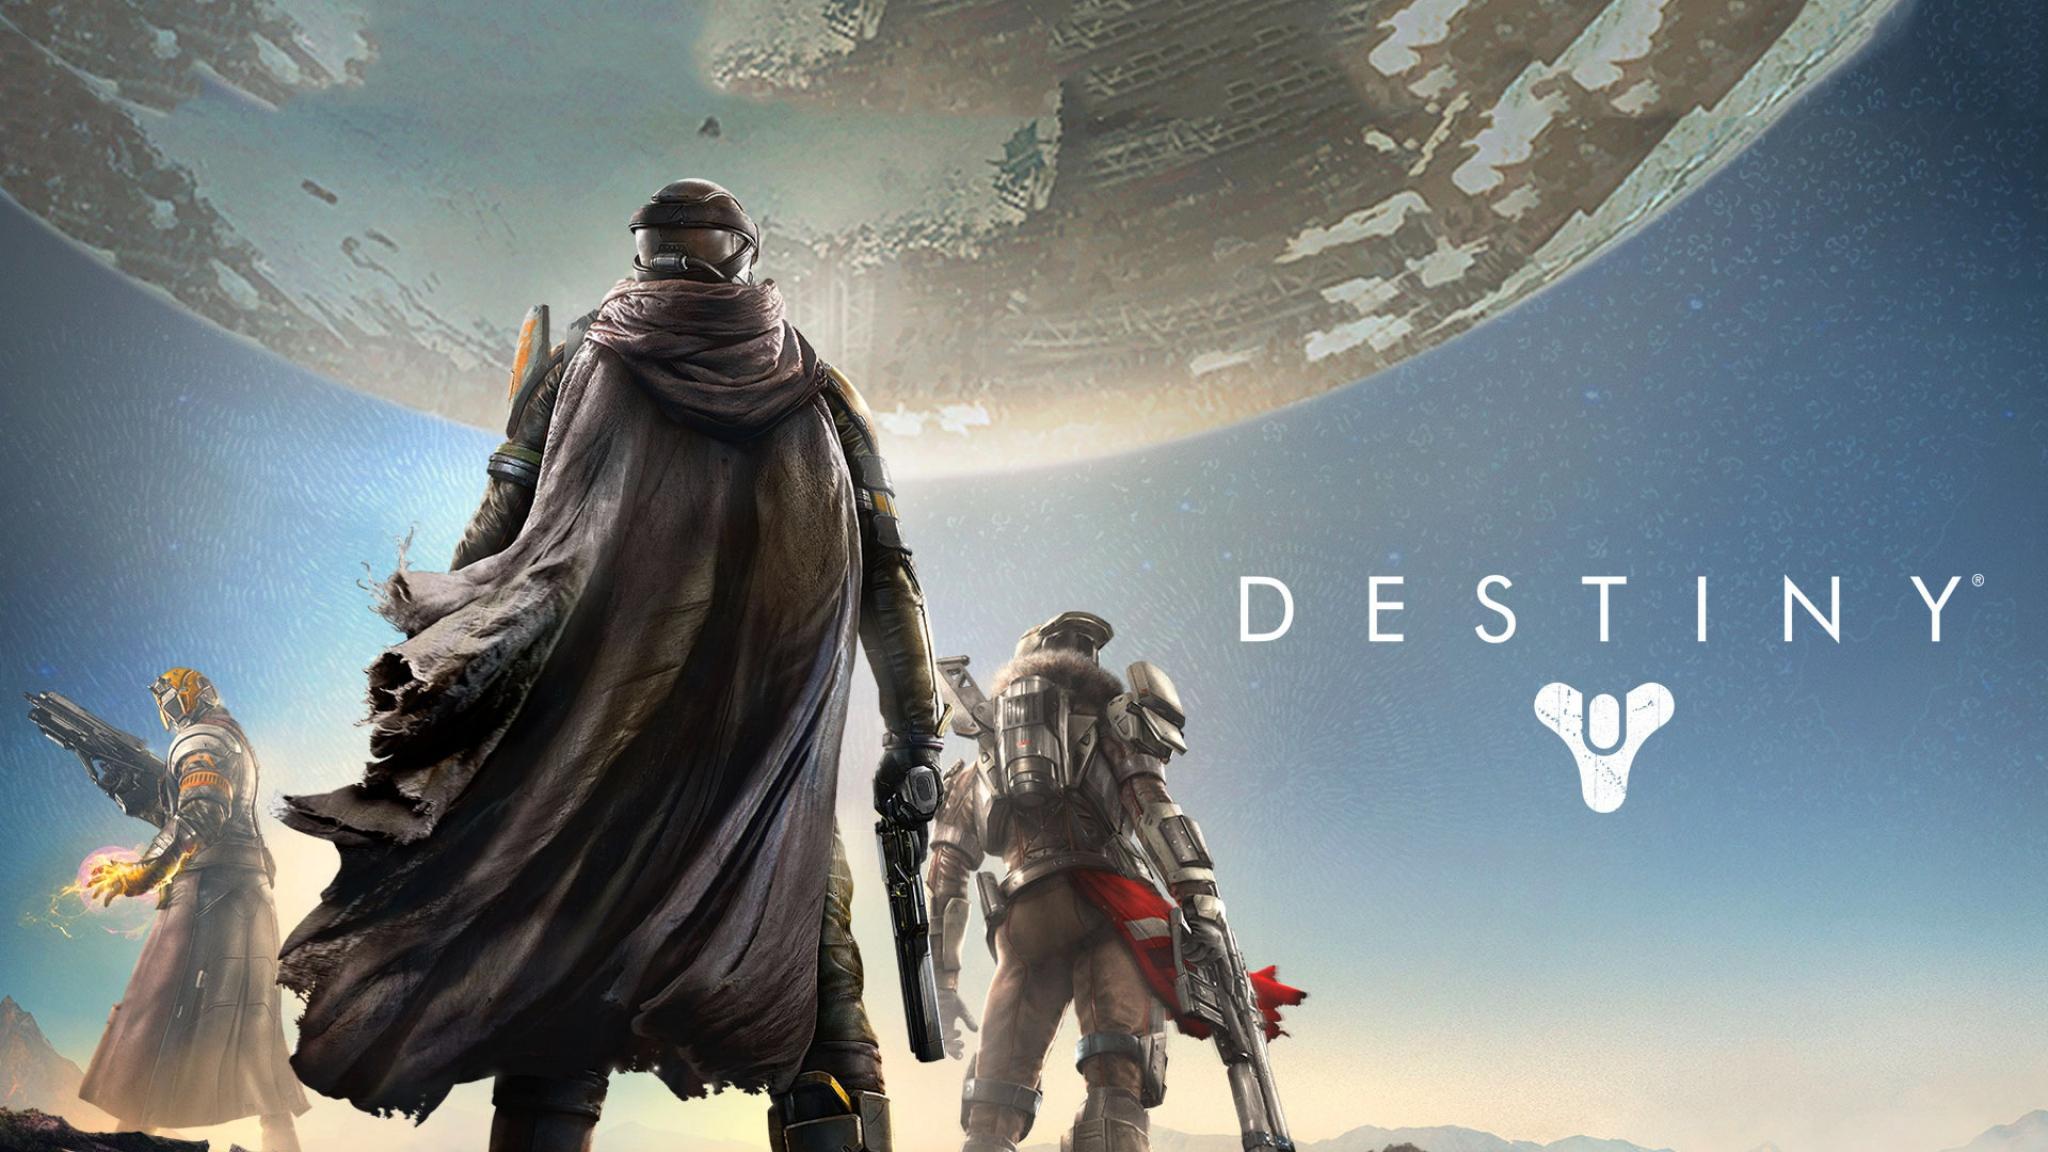 Download Wallpaper 2048x1152 destiny game 2014 HD HD Background 2048x1152